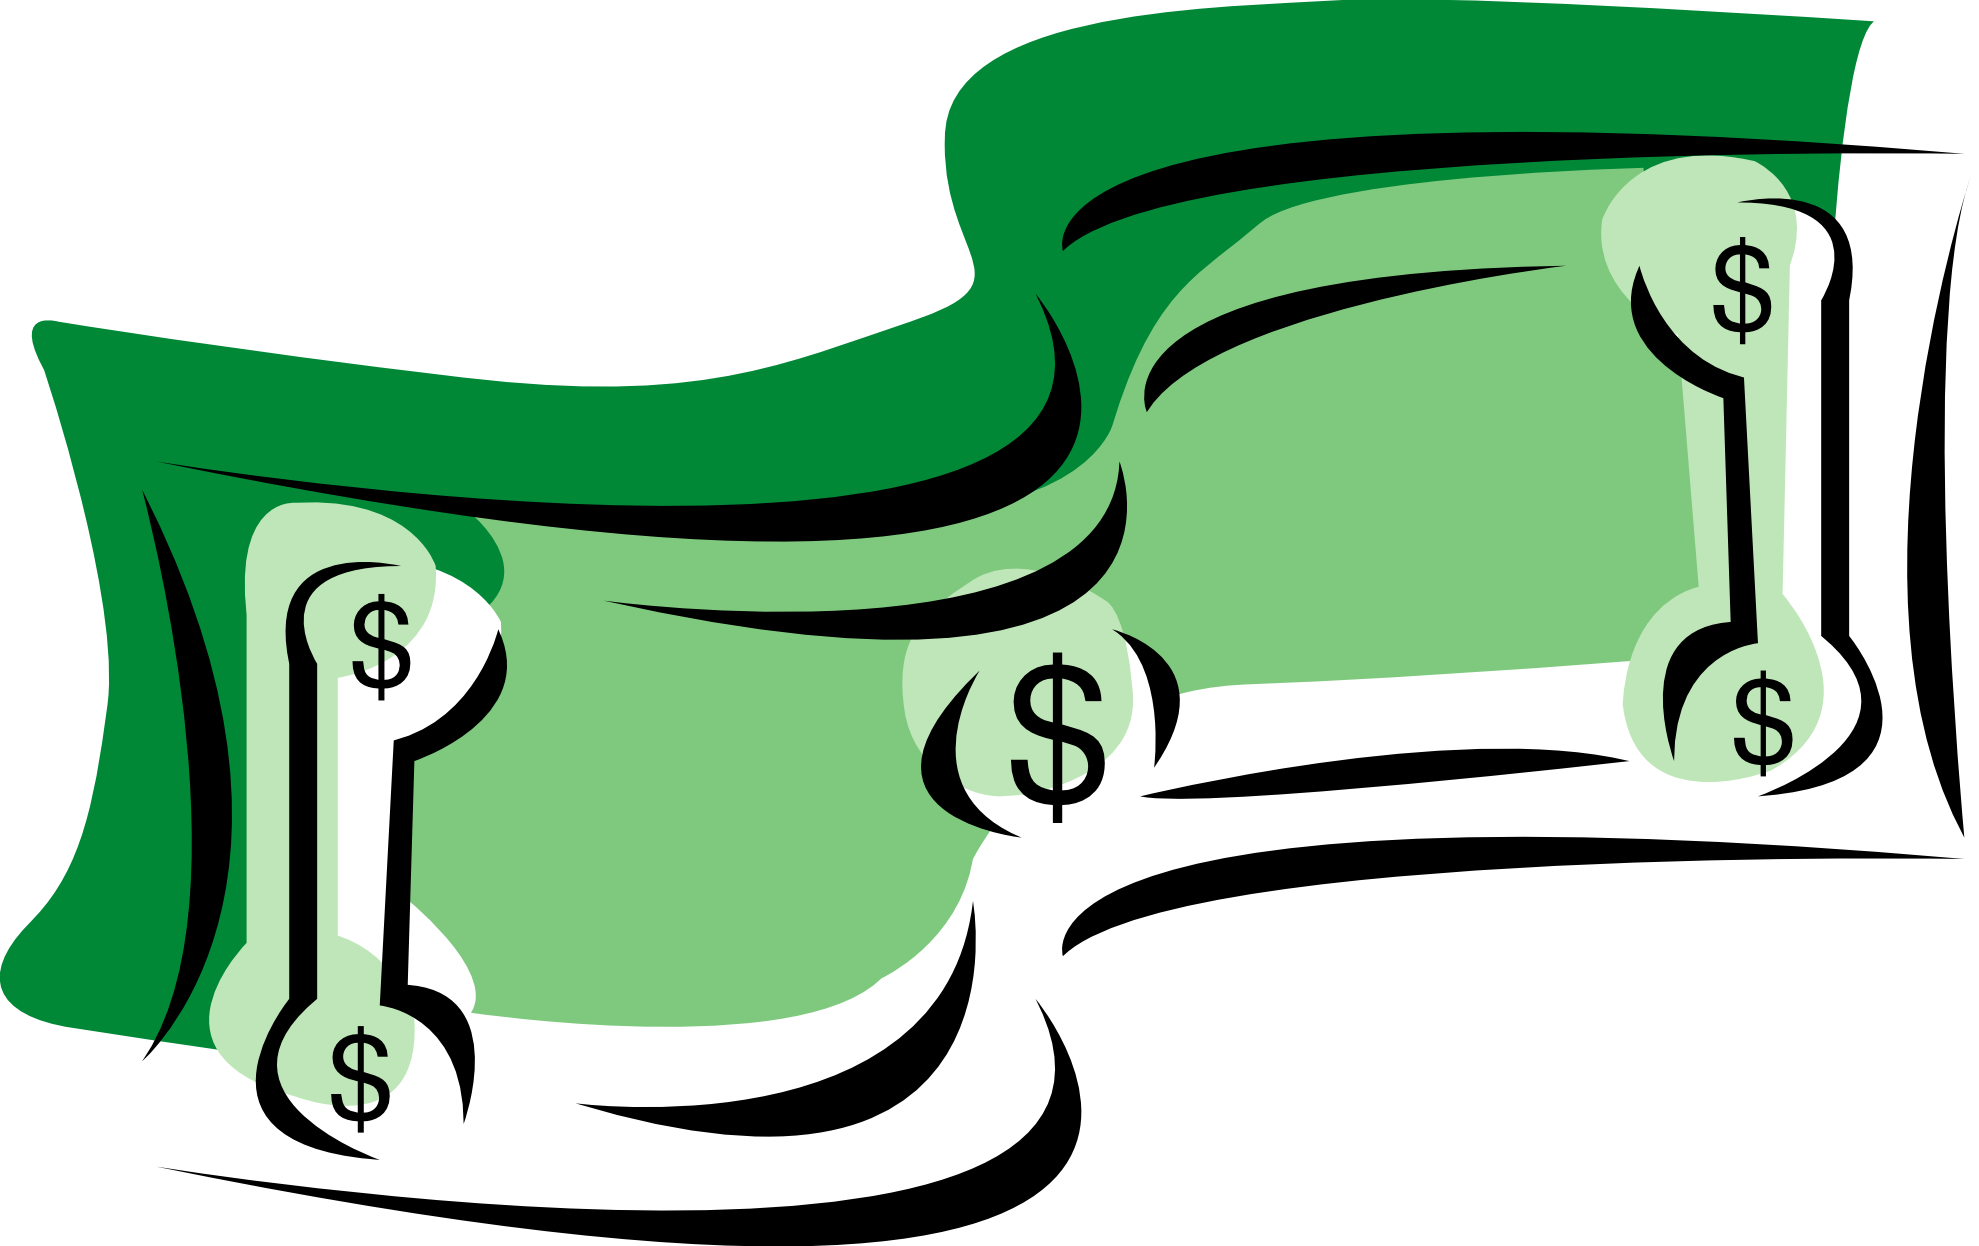 money donation clipart - photo #15